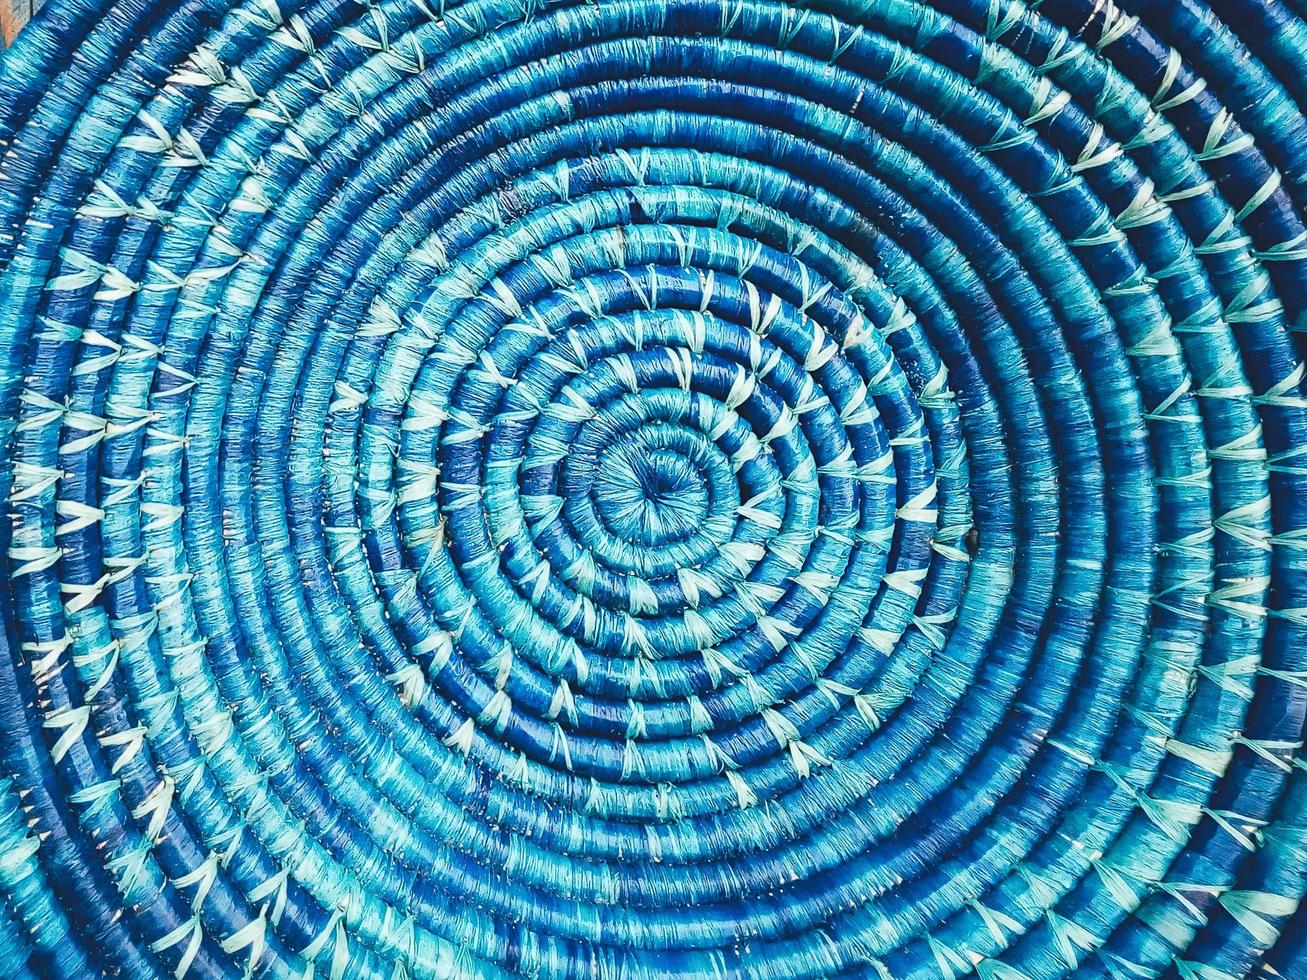 blauwe rieten ronde schotel close-up foto